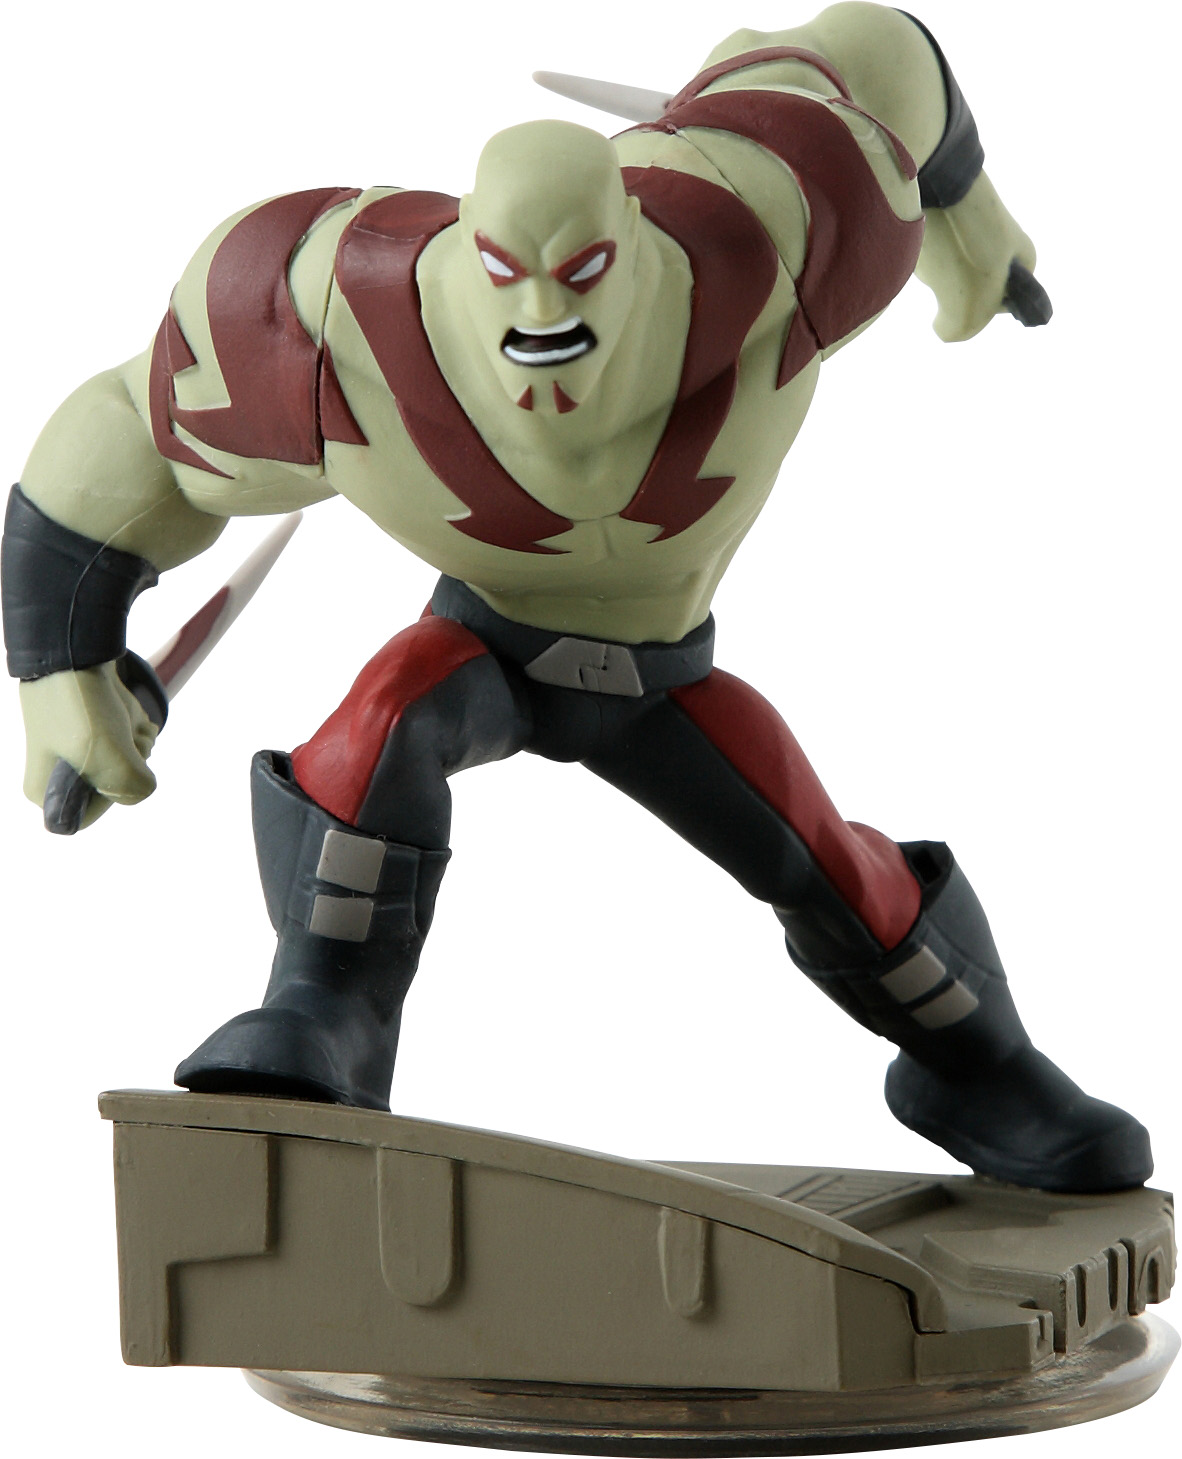 Disney Infinity 2.0 Figure: Marvel Super Heroes Drax